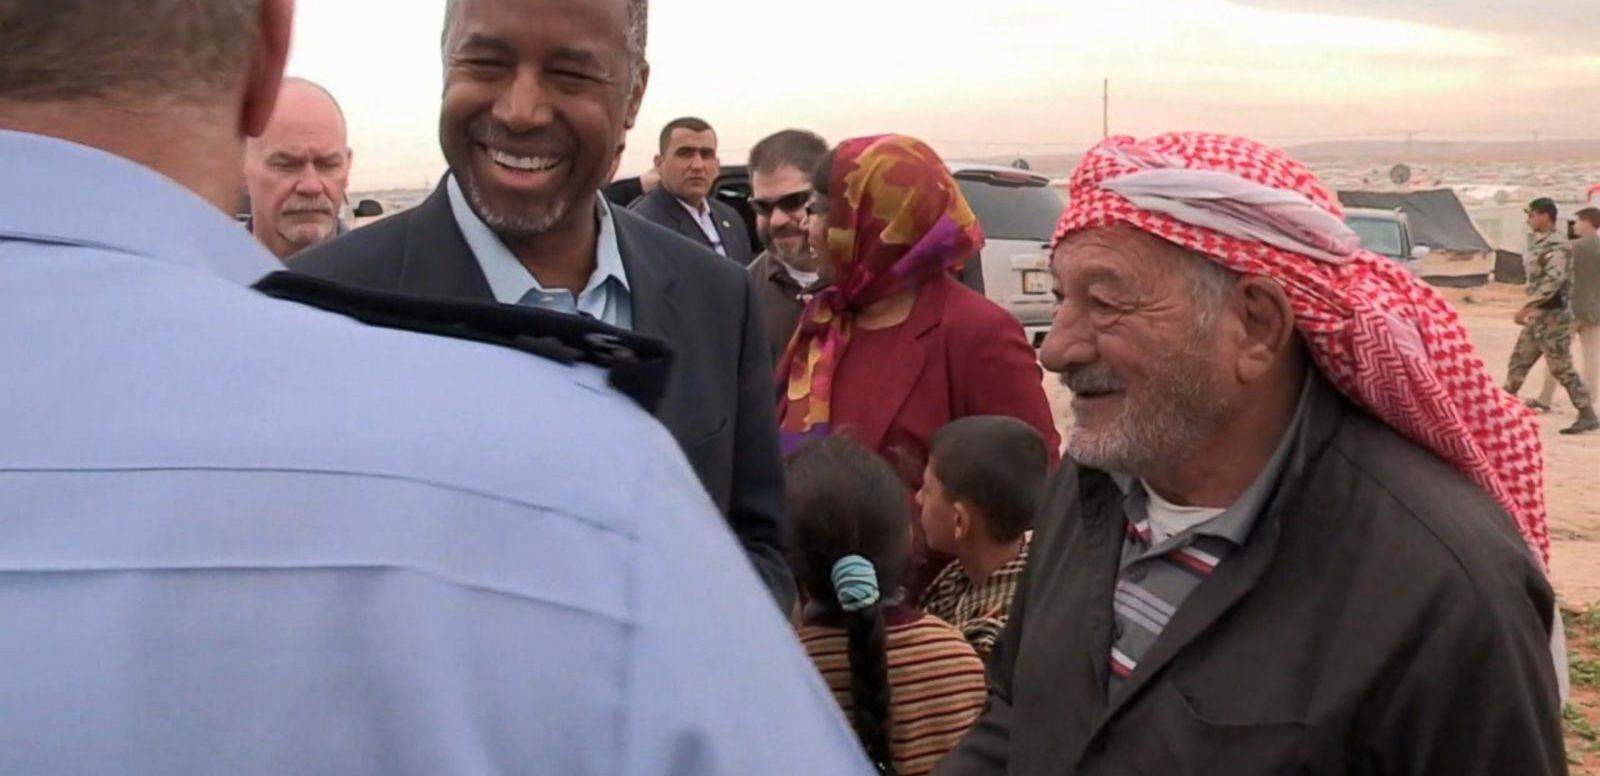 VIDEO: Republican Presidential Candidate Ben Carson Makes Surprise Trip to Jordan